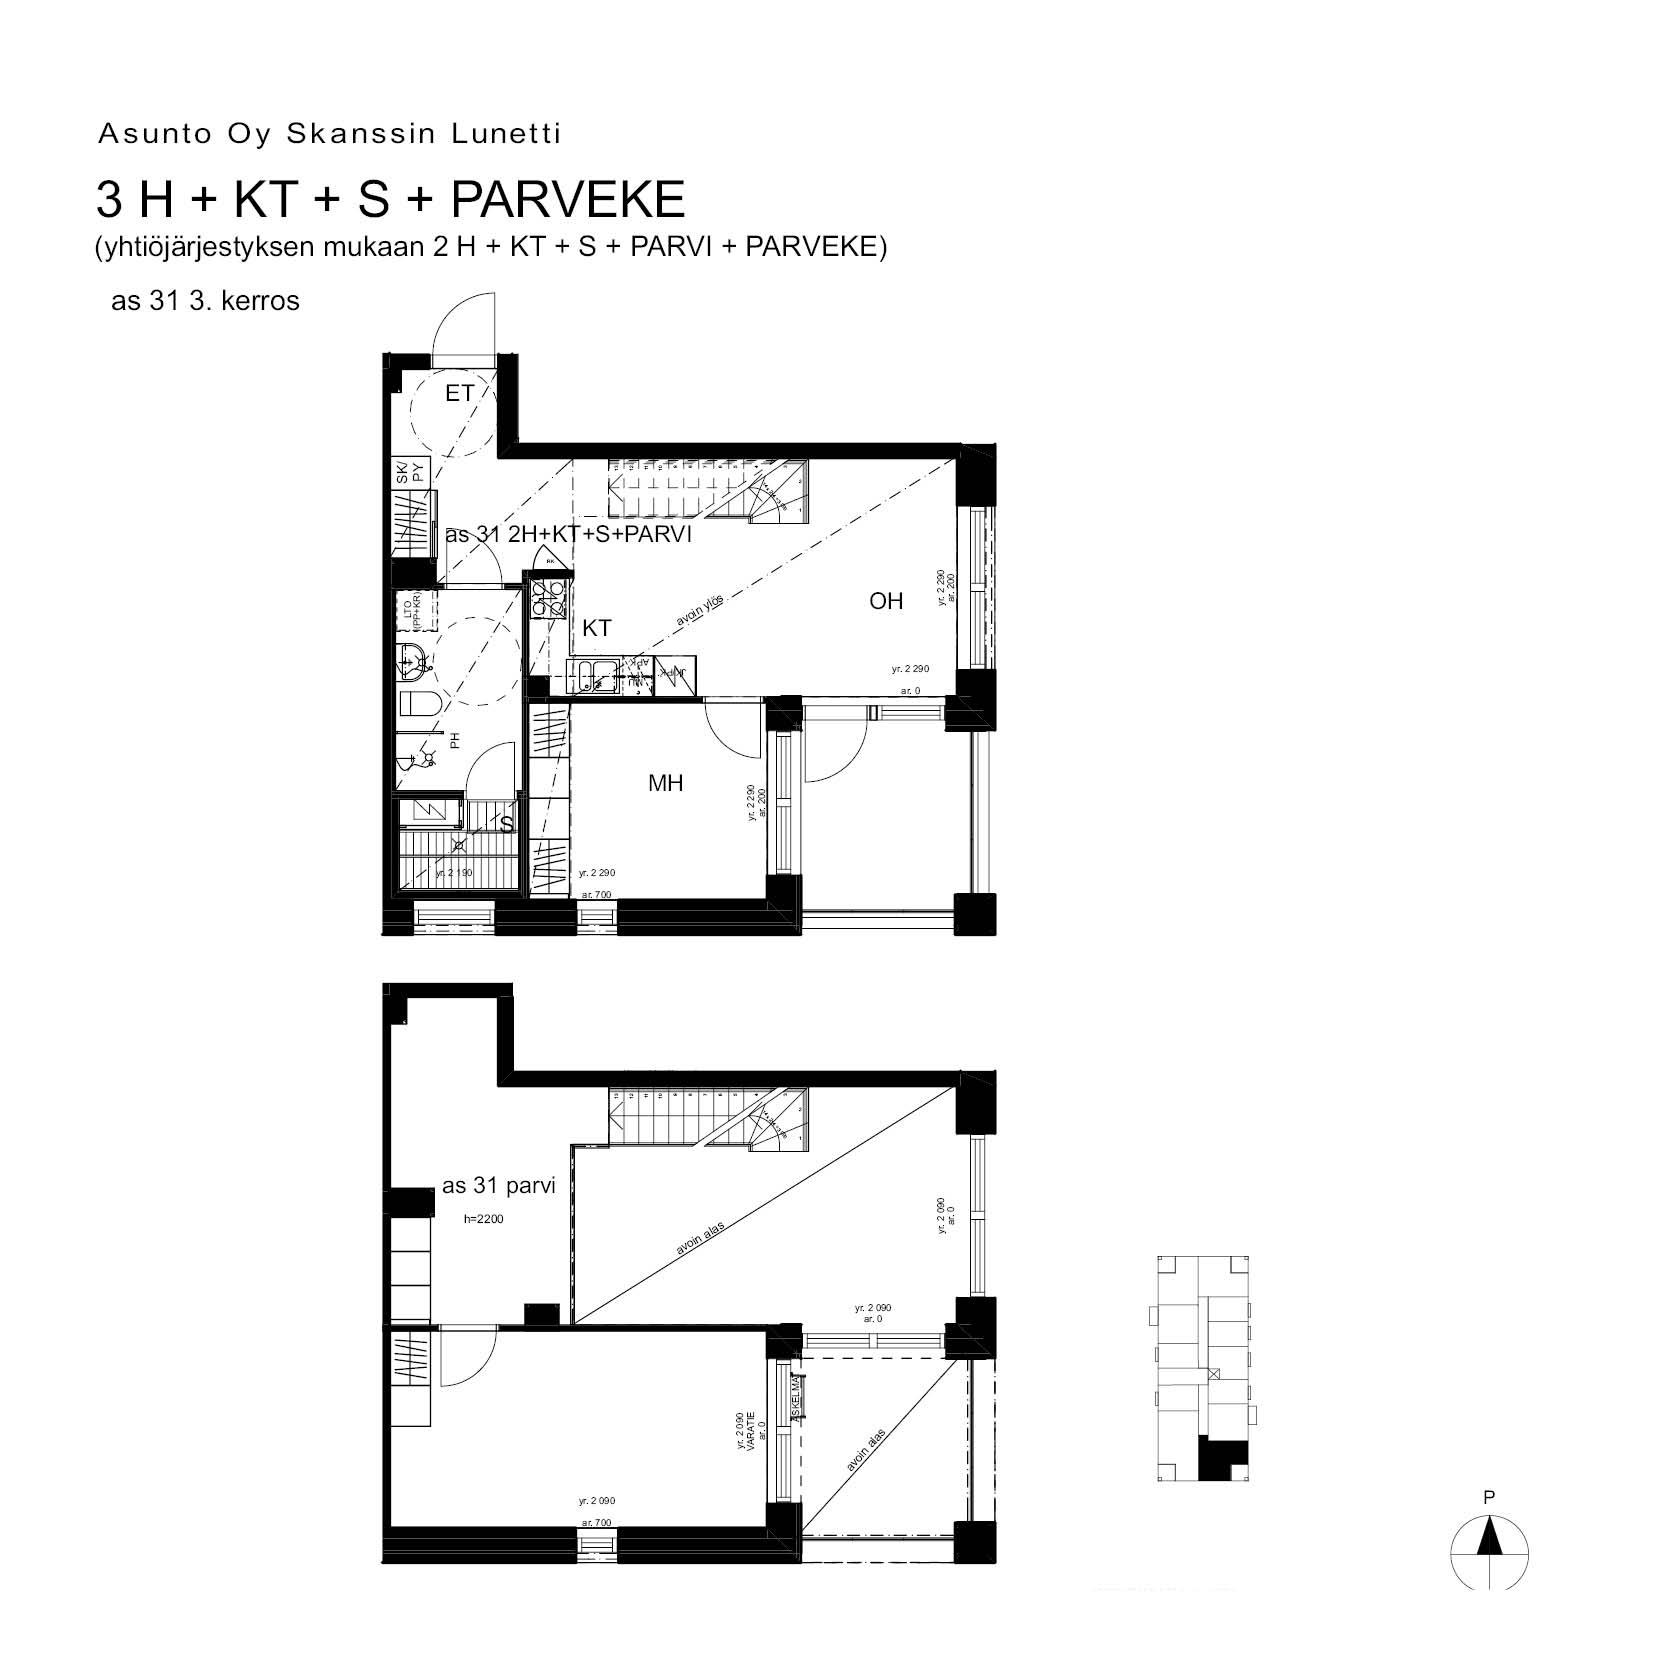 A31, 75.5 m<sup>2</sup>, 2H+K+S+PARVI+parveke